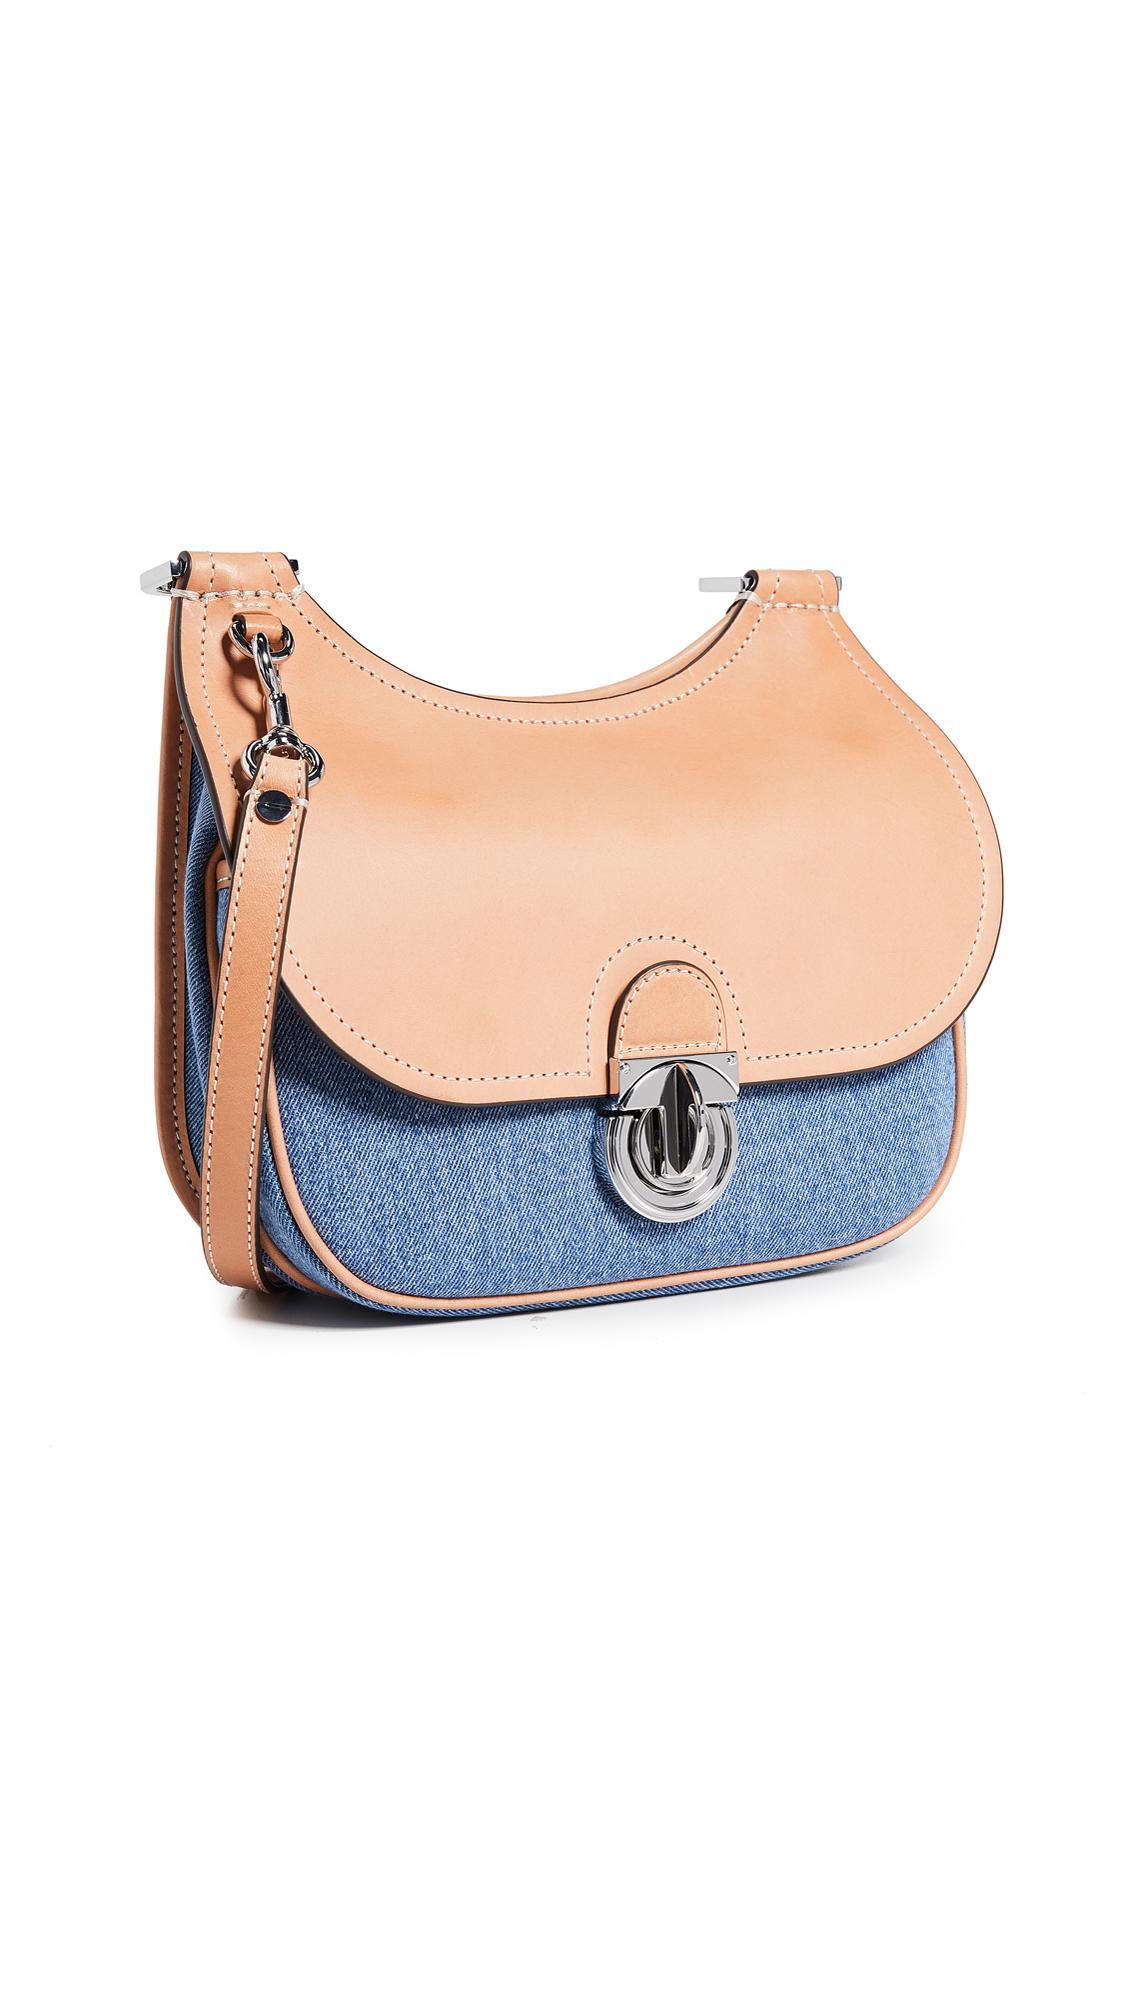 Small James Denim & Leather Saddle Bag - Blue in Evening Blue